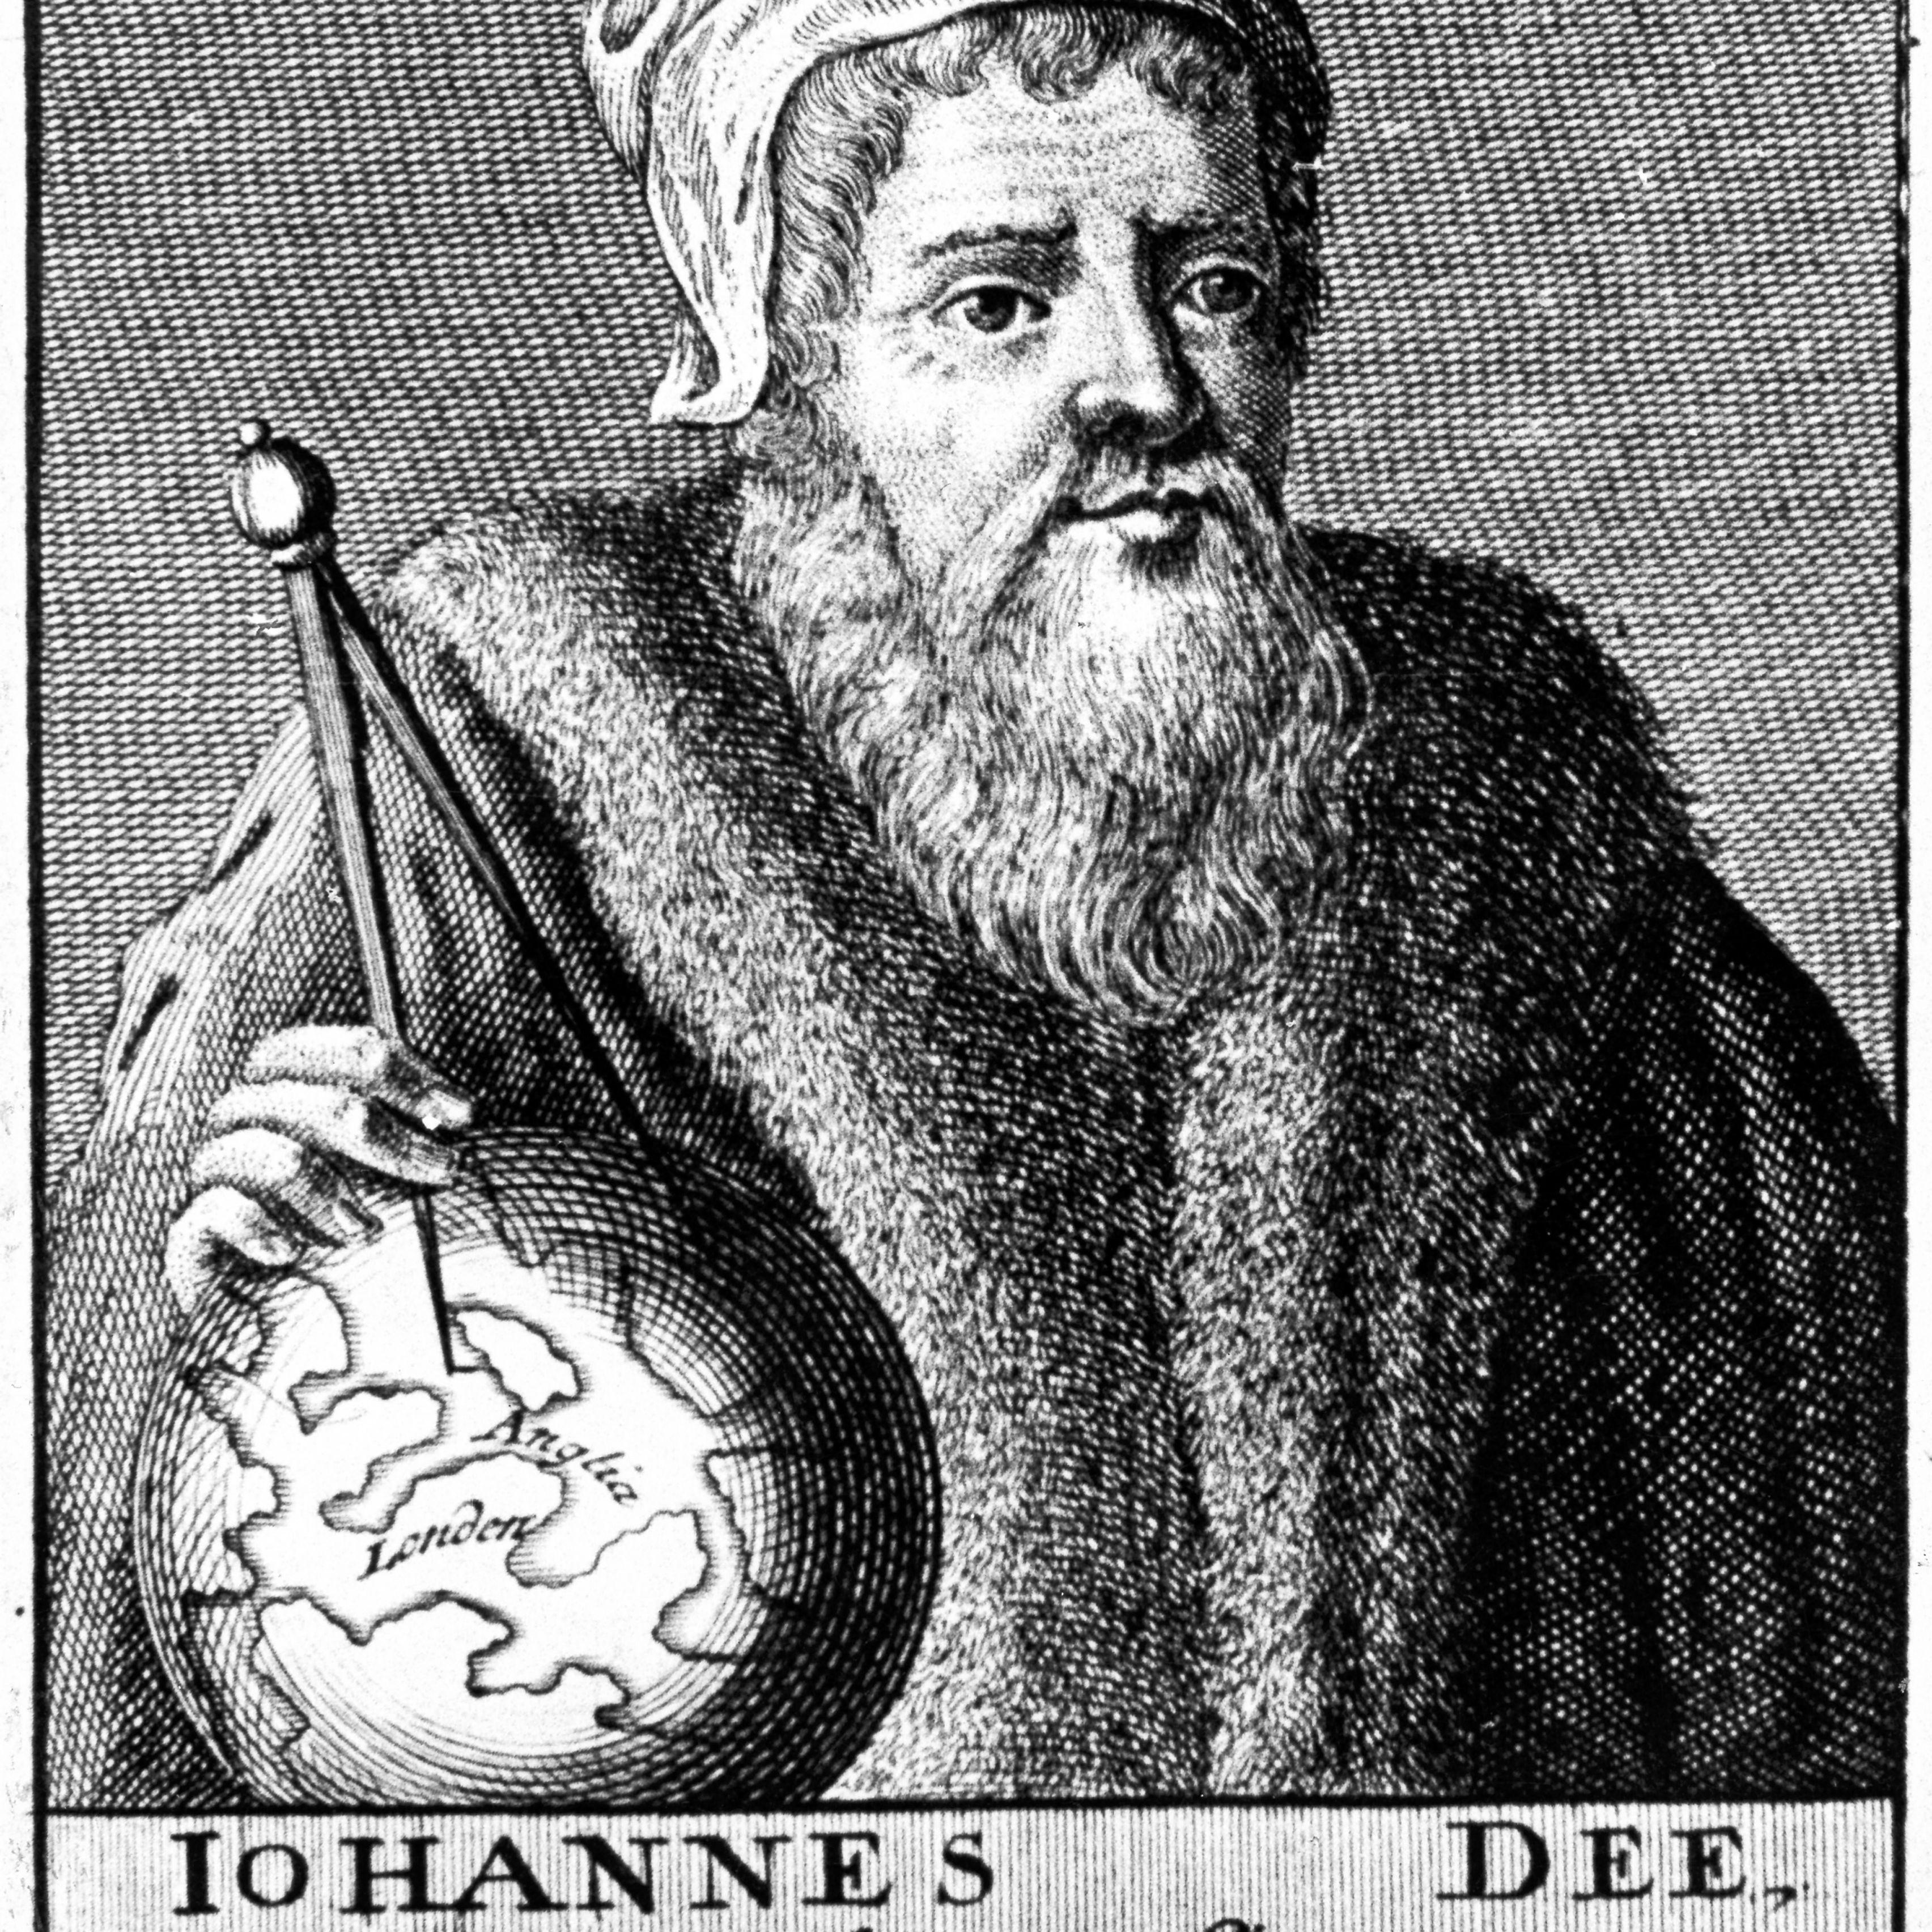 John Dee, English Alchemist, Geographer and Mathematician, c1590 (18th century).